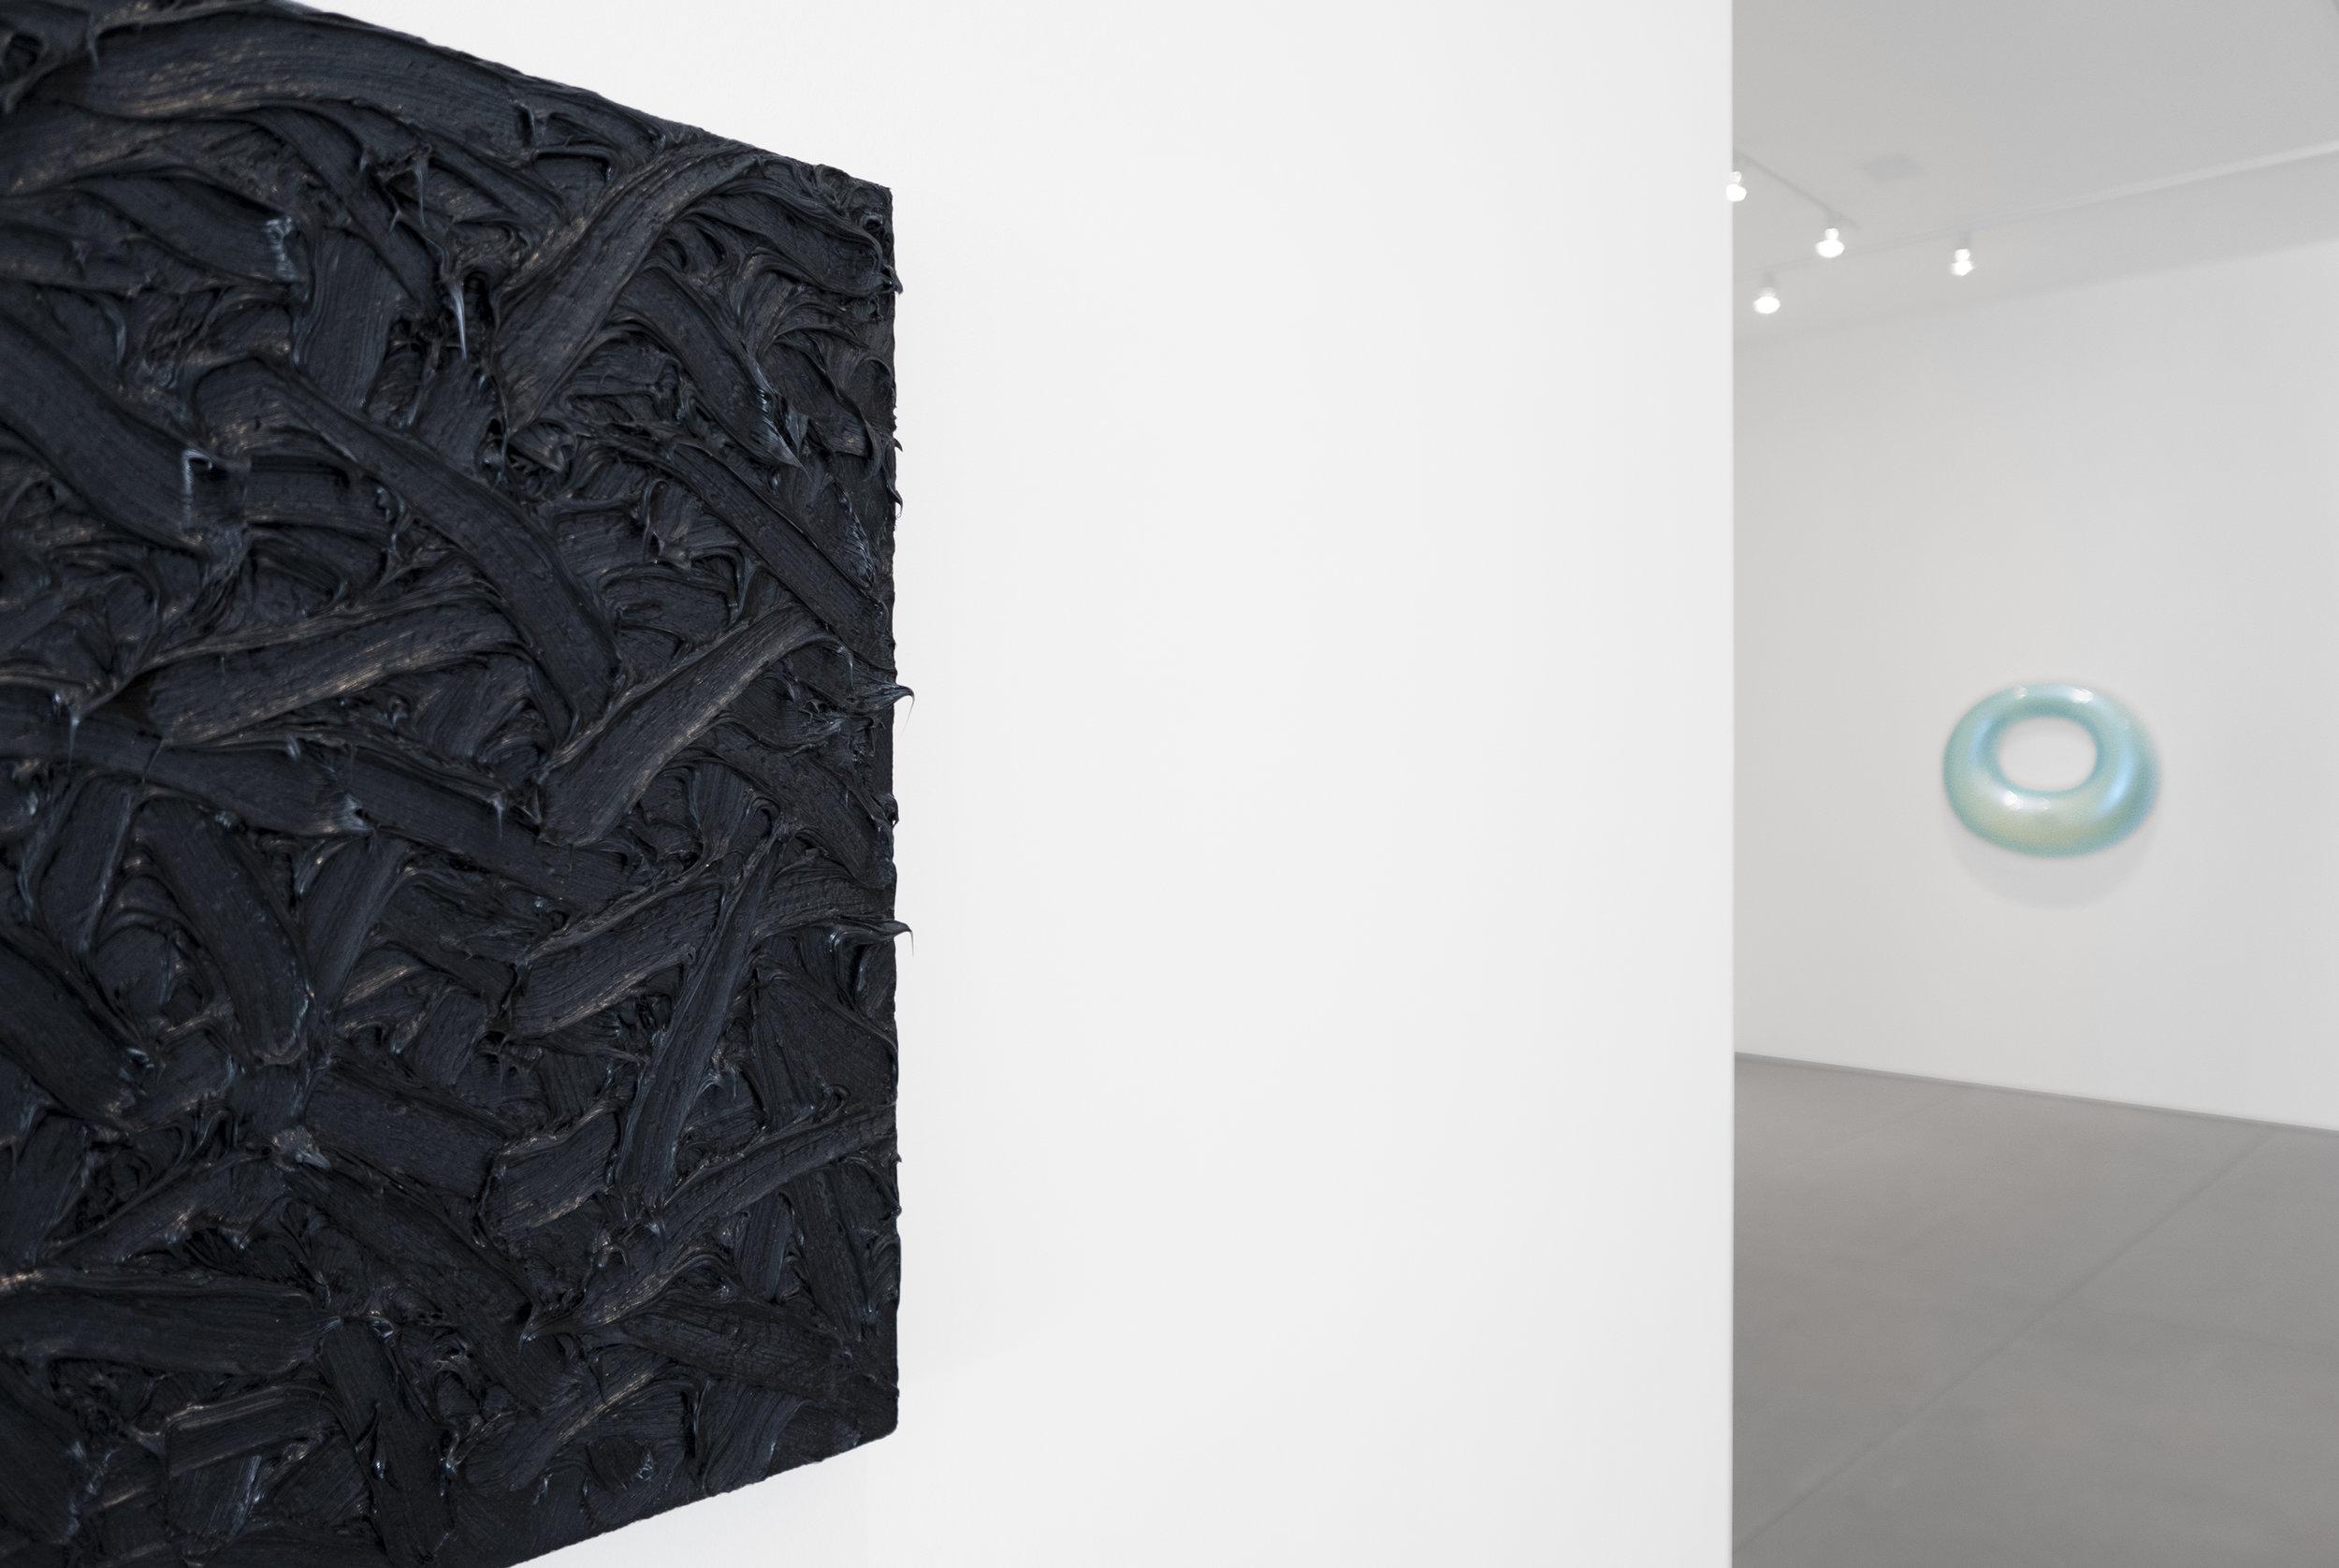 25 Years_Peter Blake Gallery_2019_Installation View_42.jpg